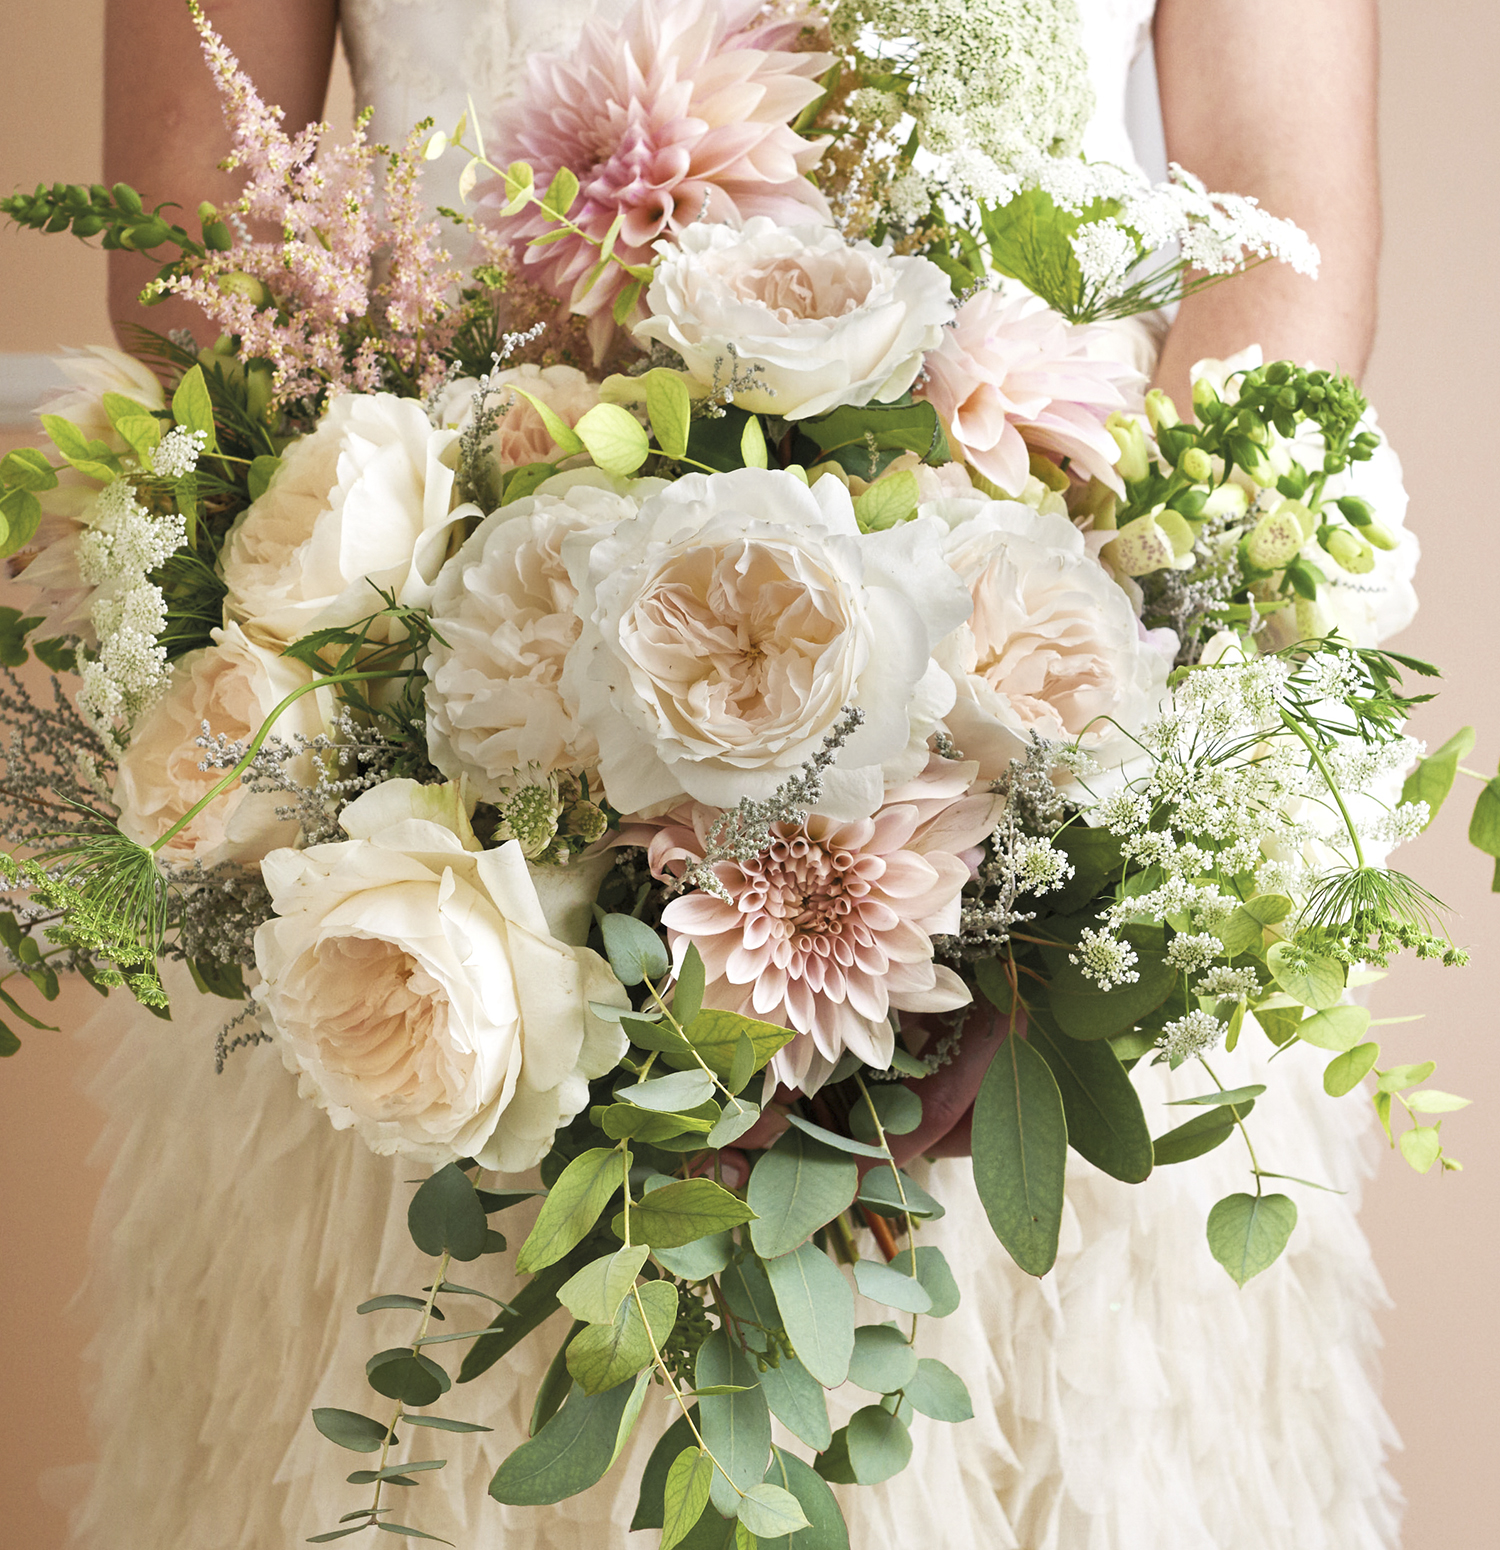 Purity blush roses wedding bouquet design